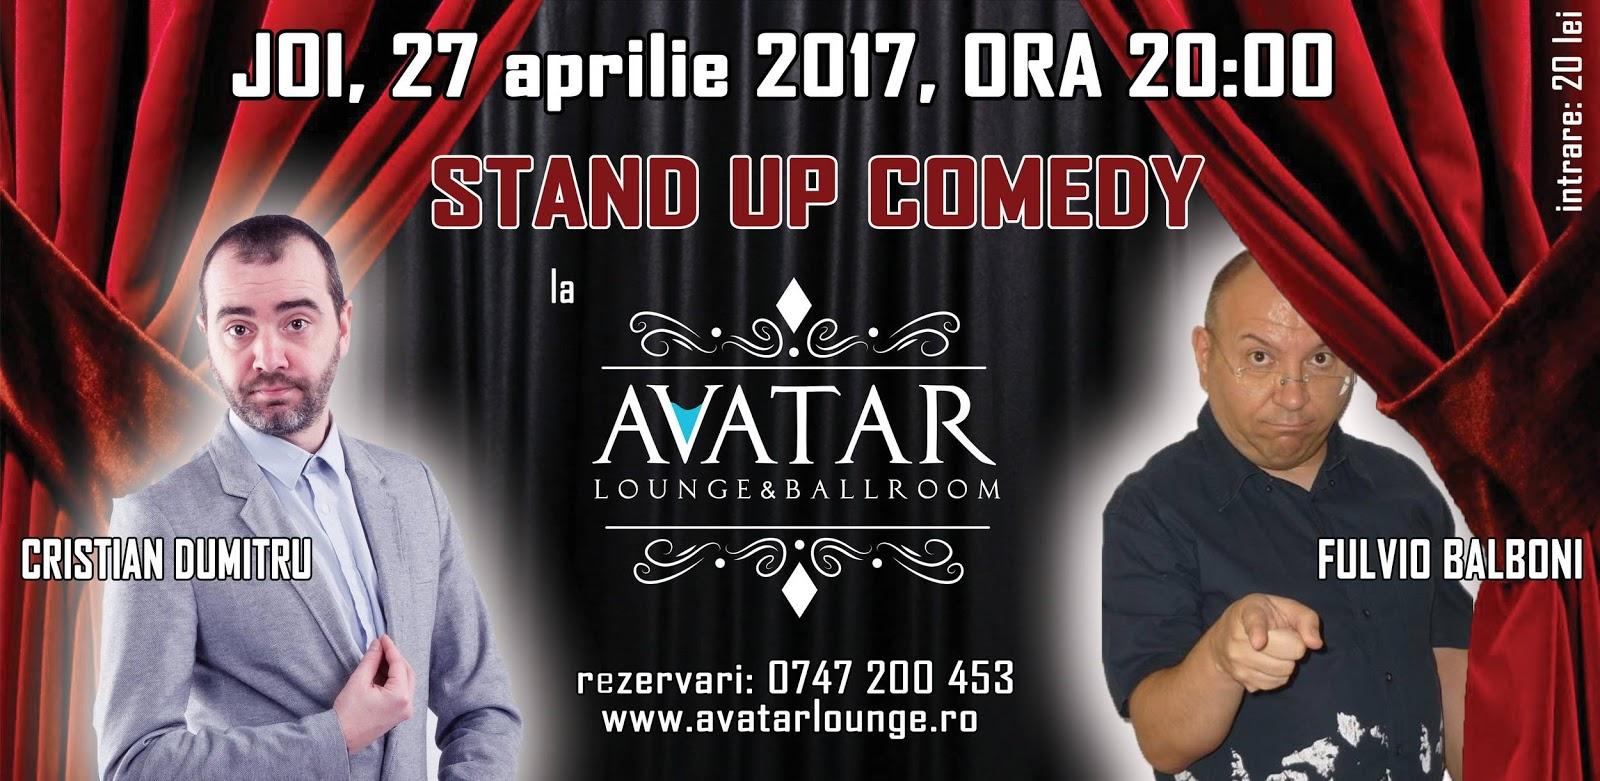 Stand-Up Comedy Joi 27 Aprilie Bragadiru